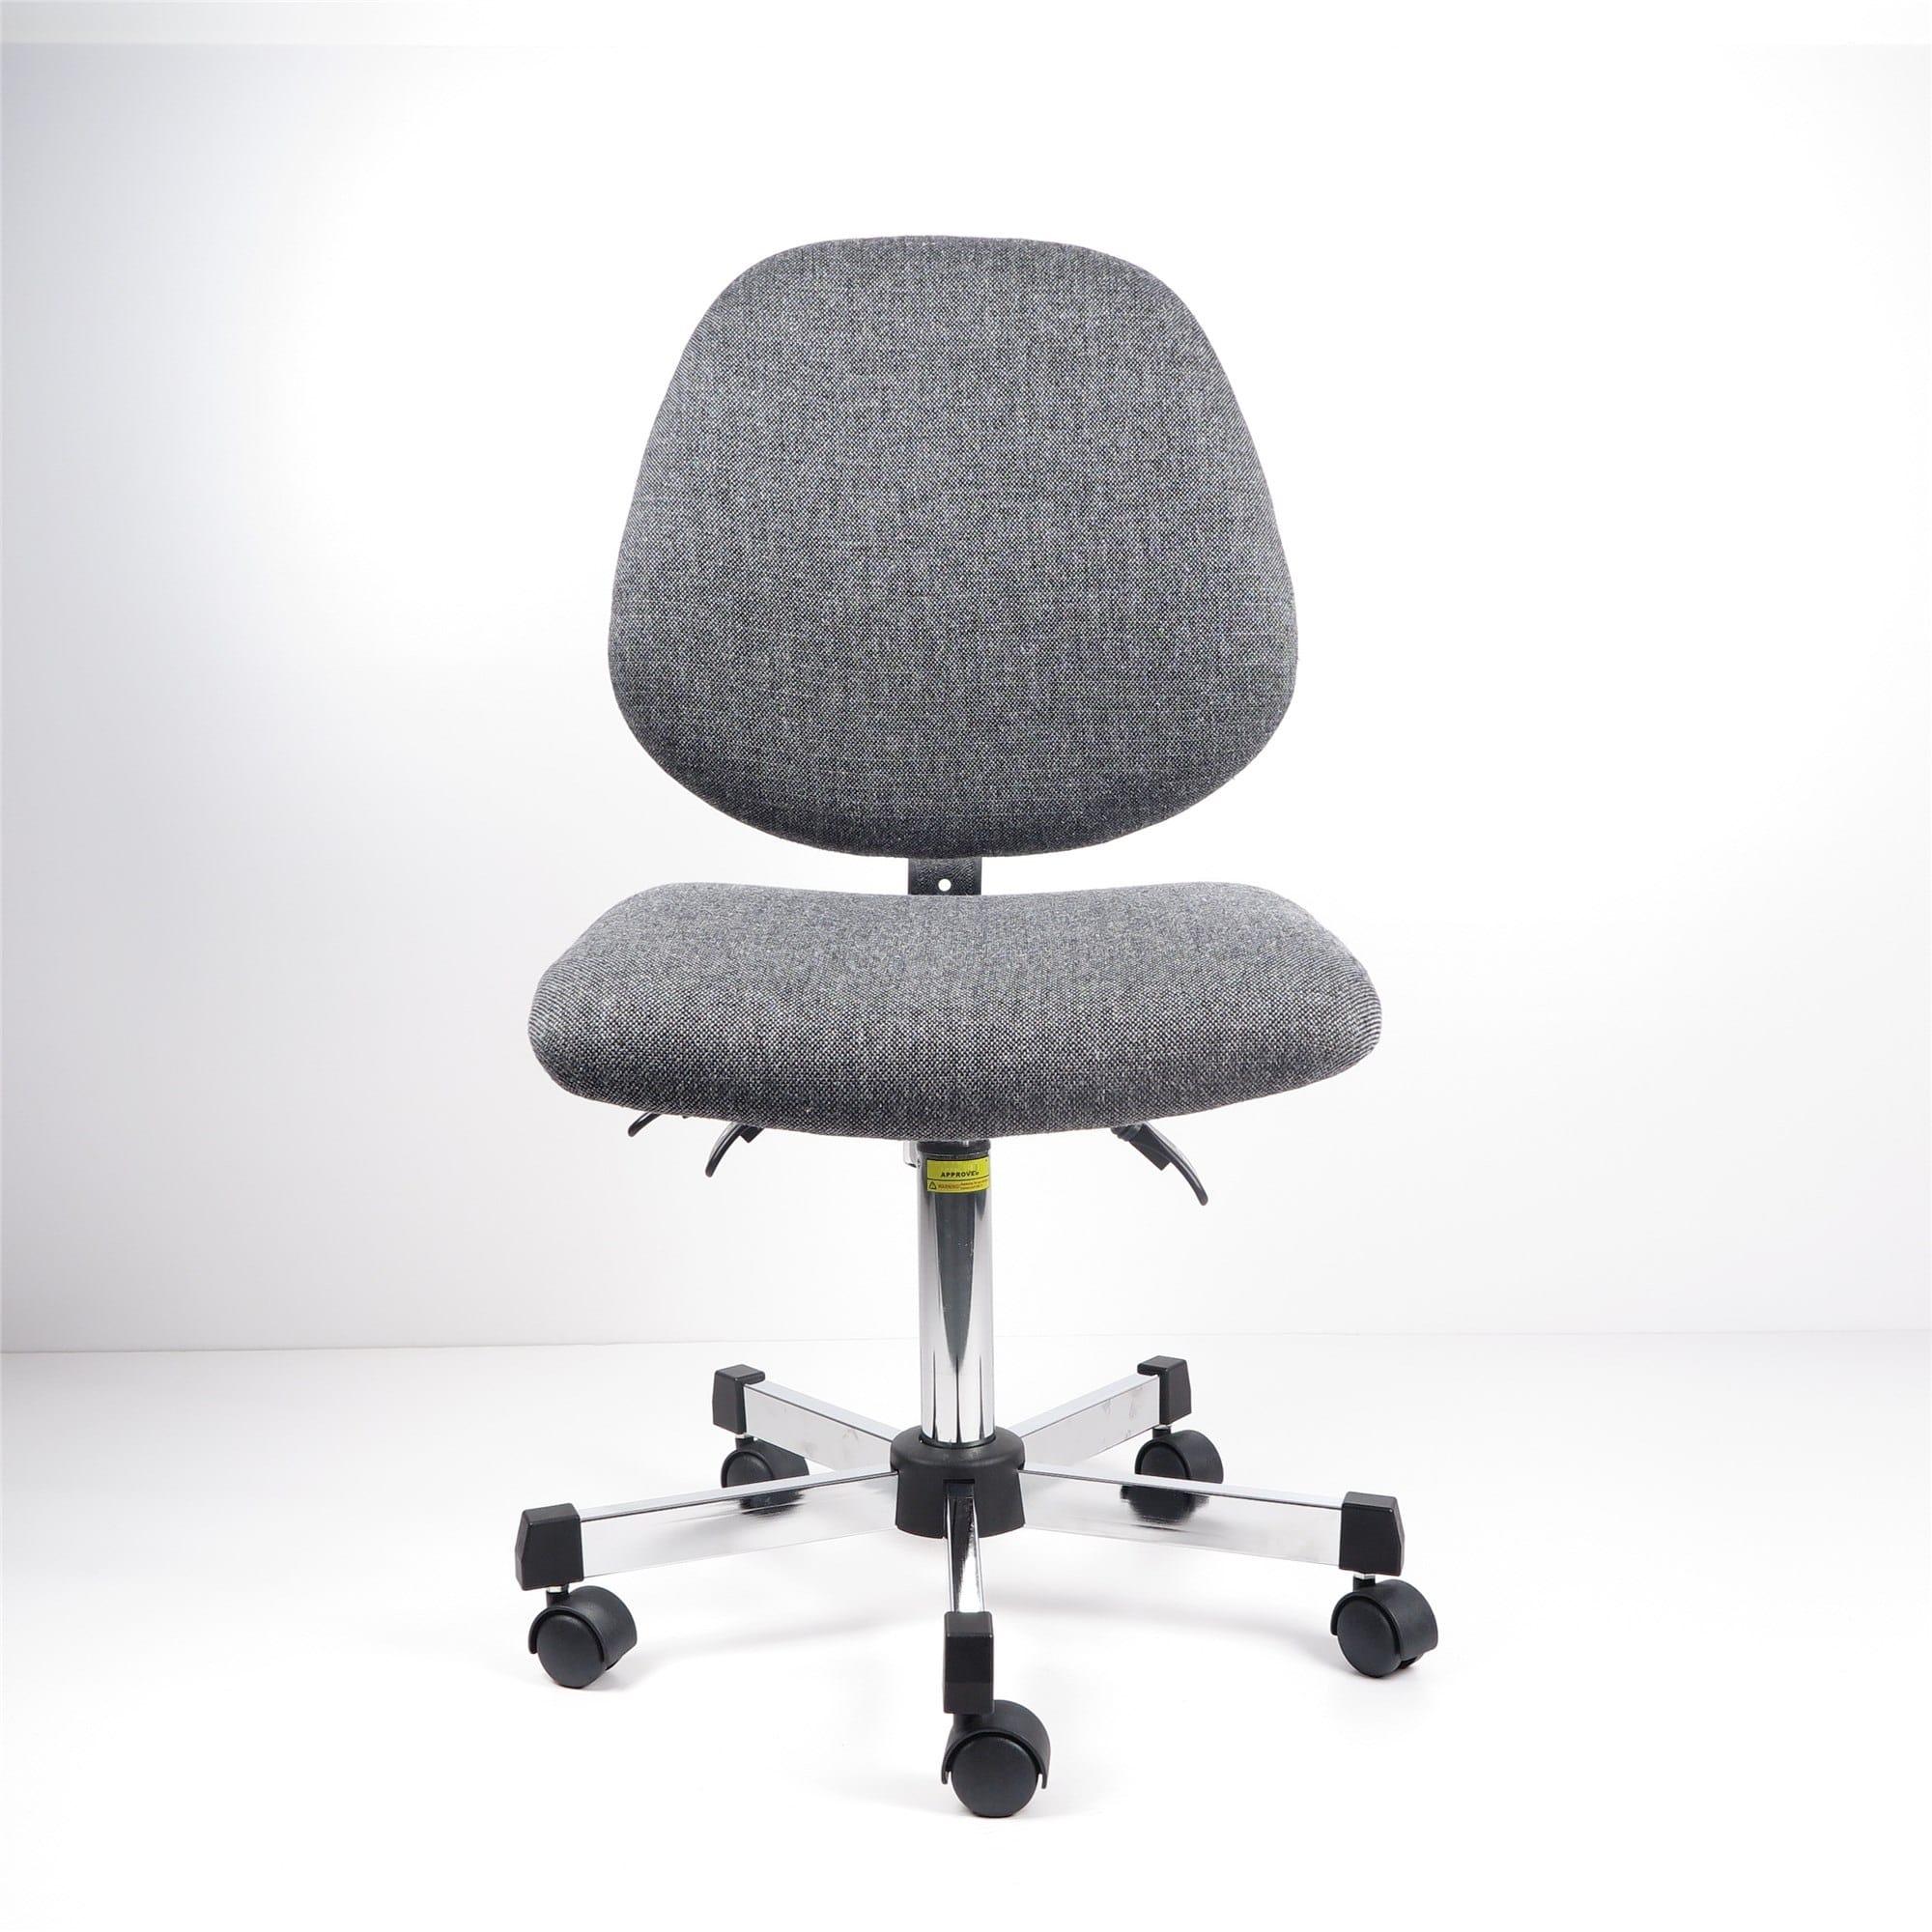 Extra Comfort Style (+£39.99 Ex. VAT)